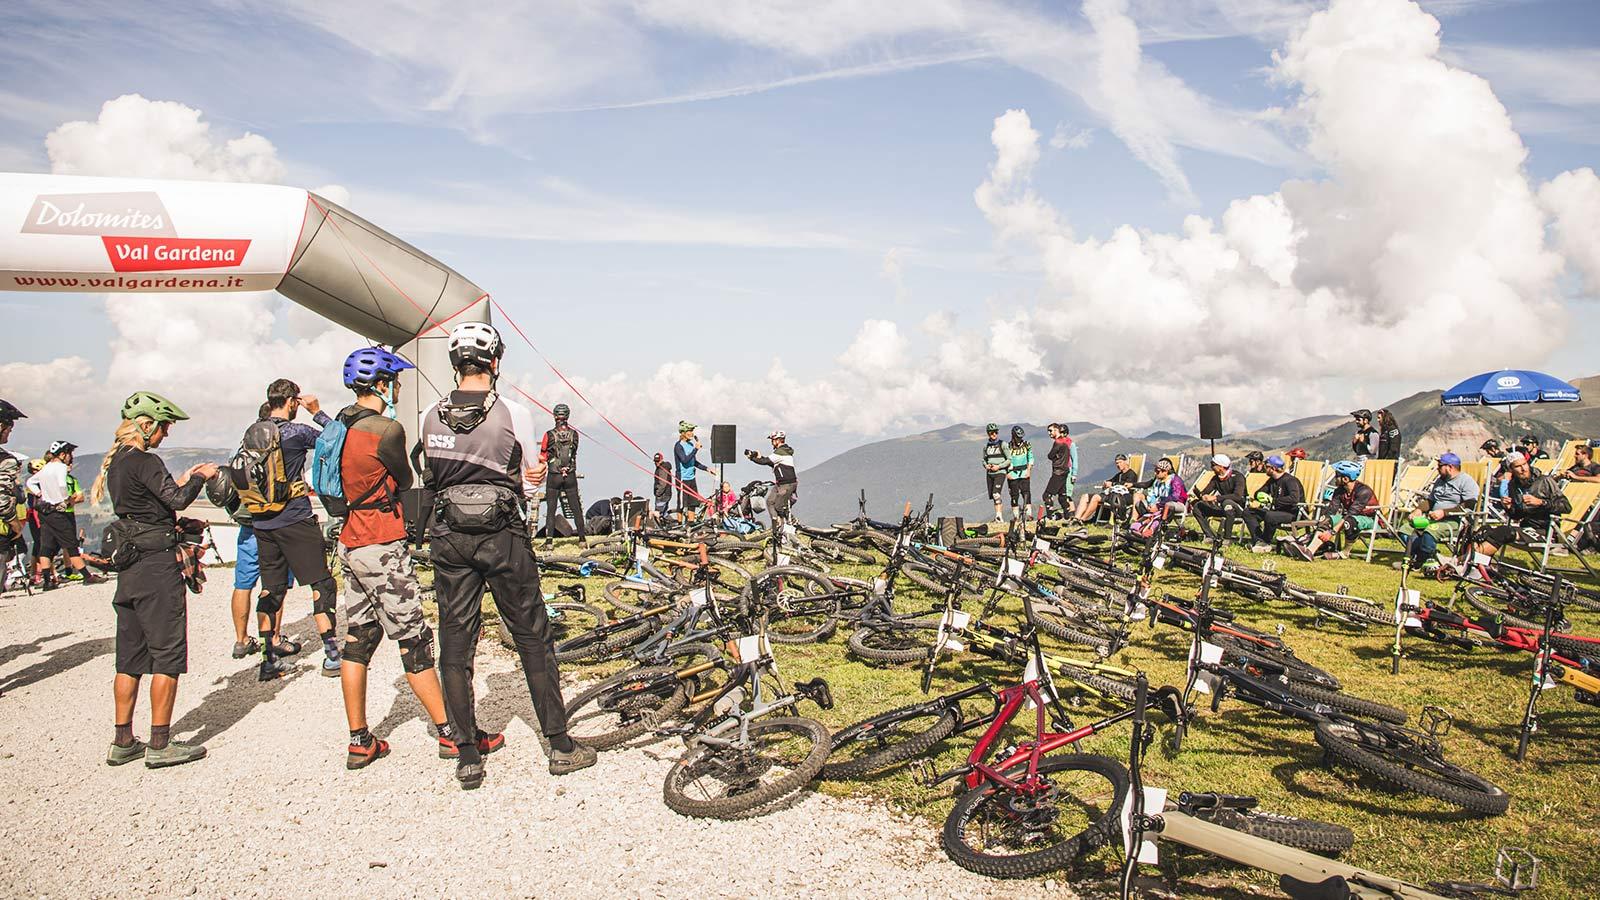 Event Knödeljagd 2021 Gröden Val Gardena - Startvorbereitung